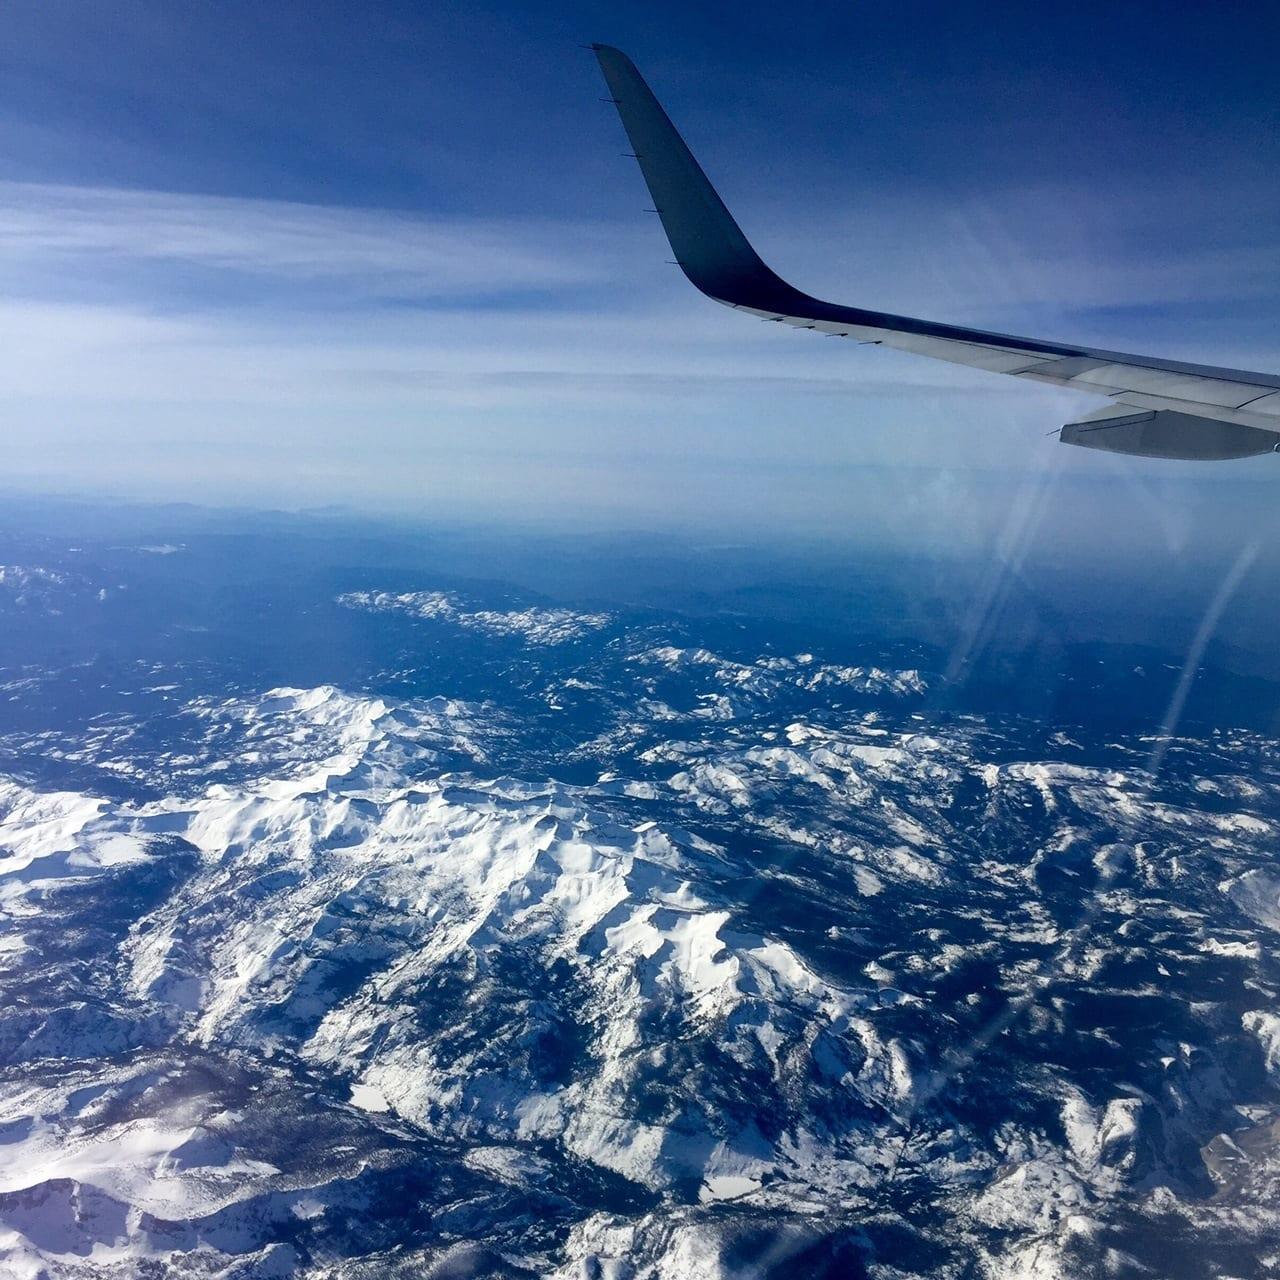 Flying over Yosemite